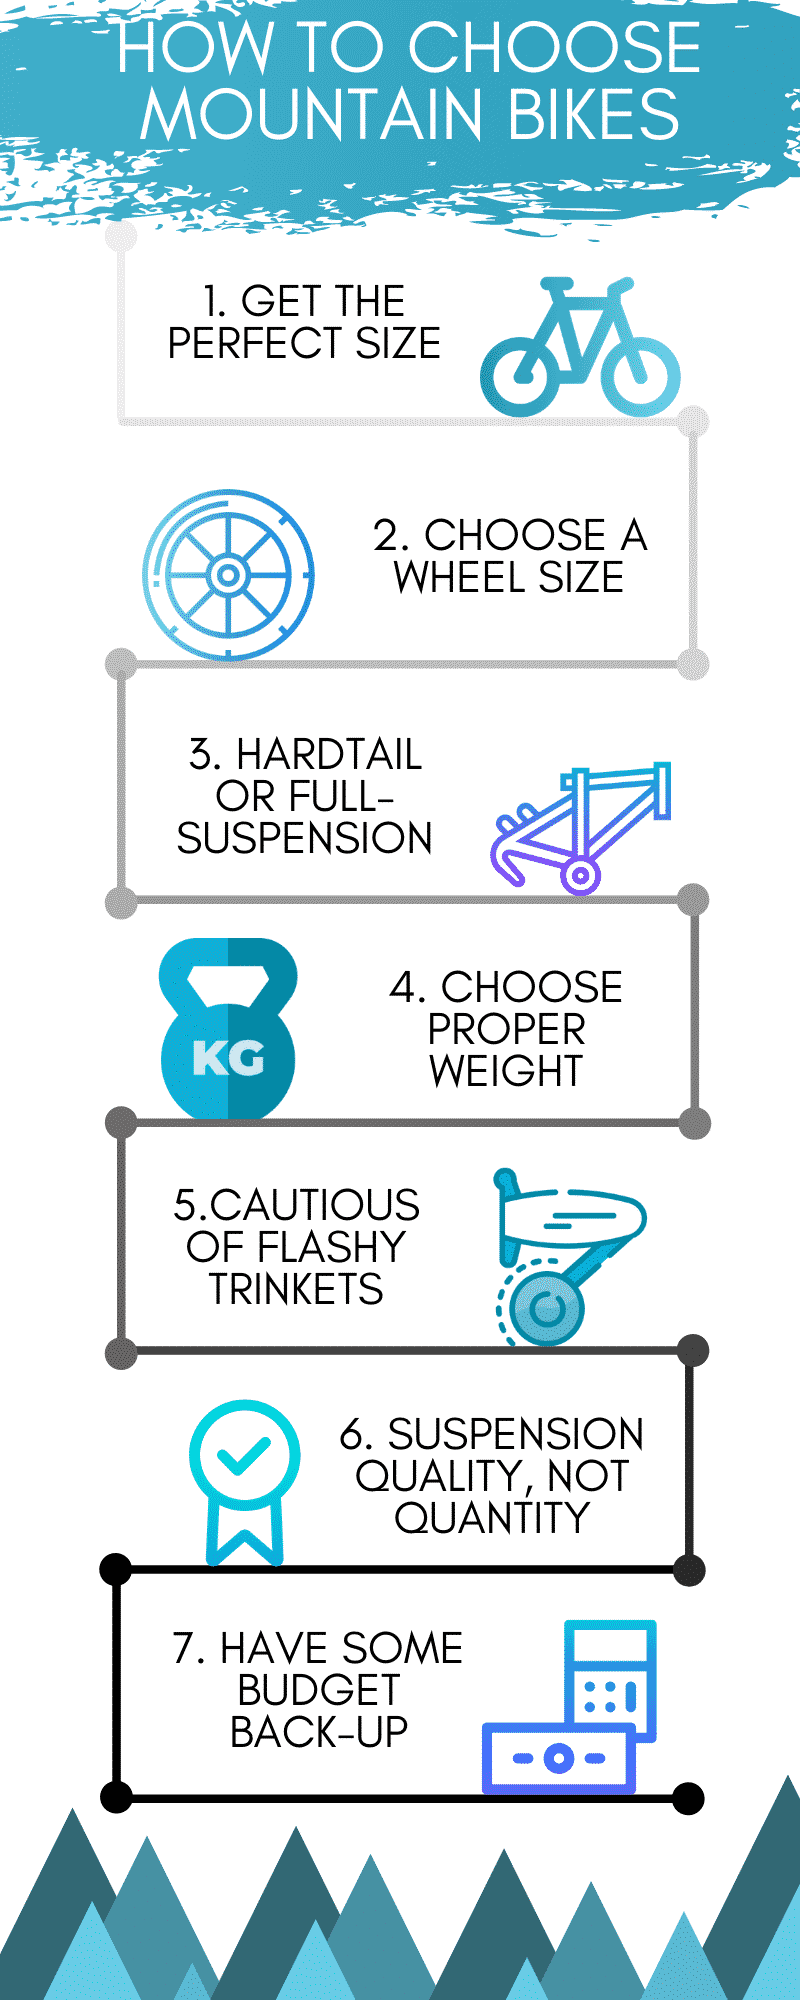 how-to-choose-mountain-bikes